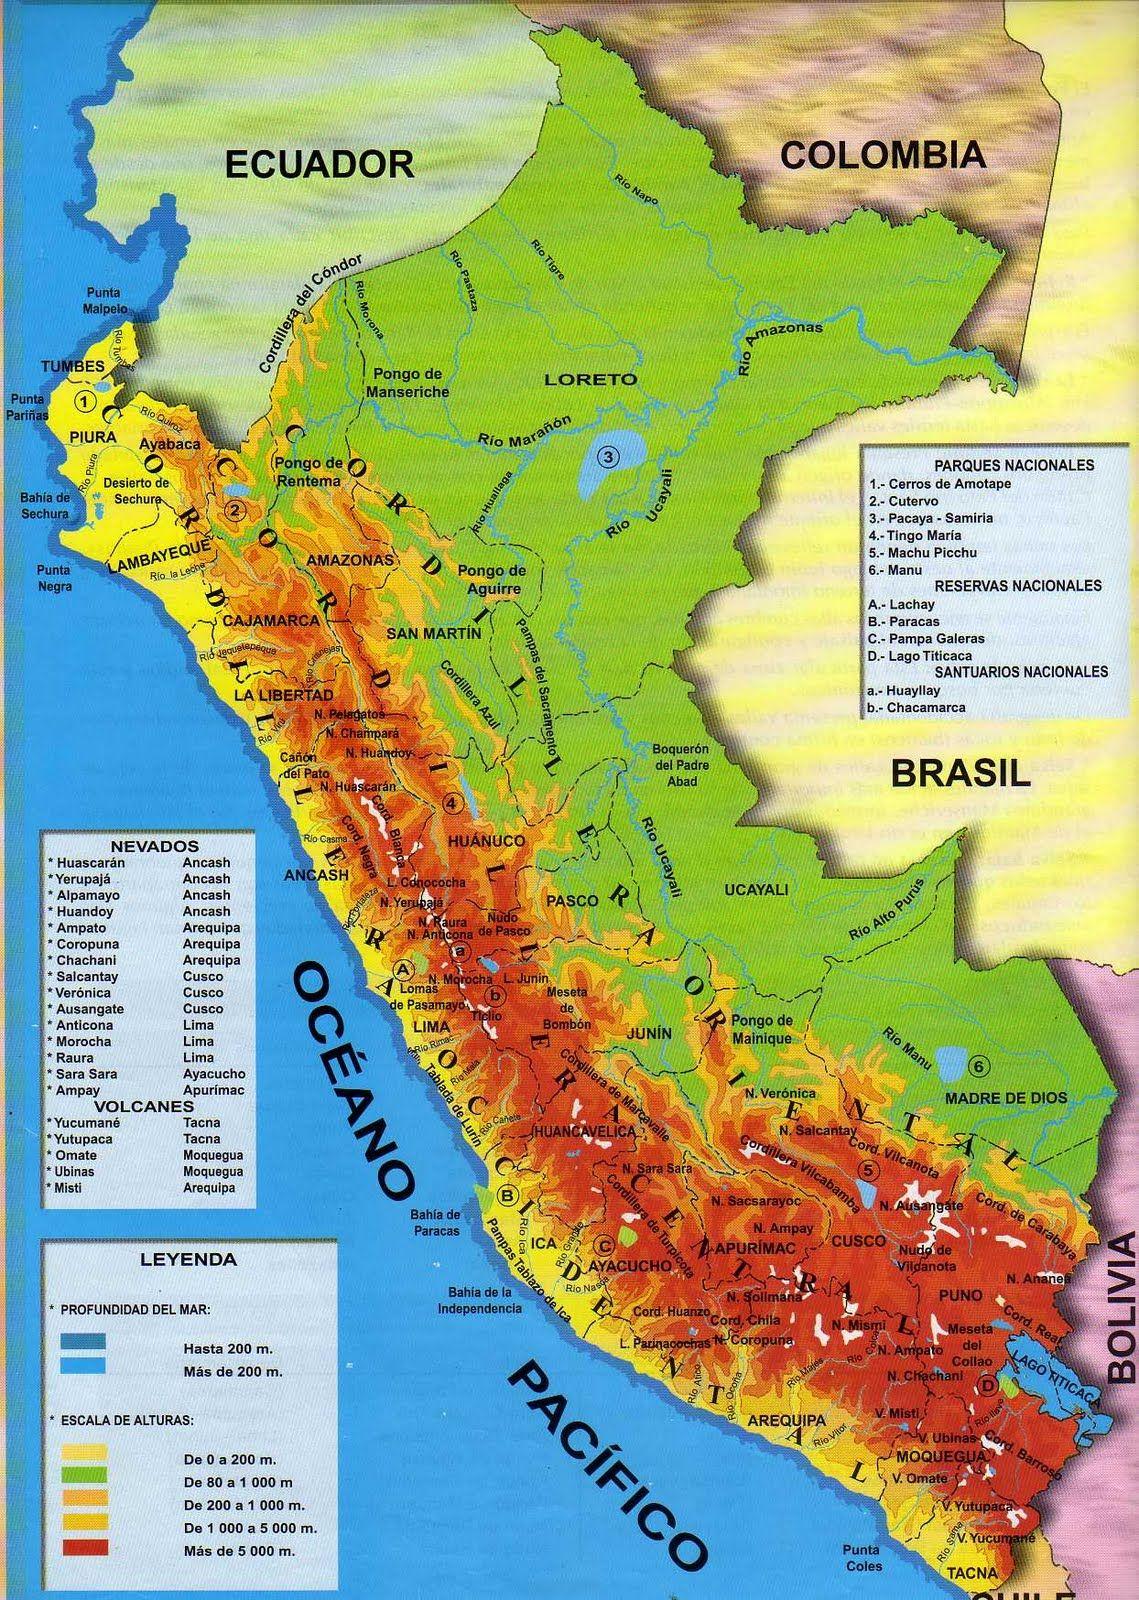 PARA MIS TAREAS: MAPA FÍSICO DEL PERÚ http://paramitarea.blogspot.com/2011/07/mapa-fisico-del-peru.html